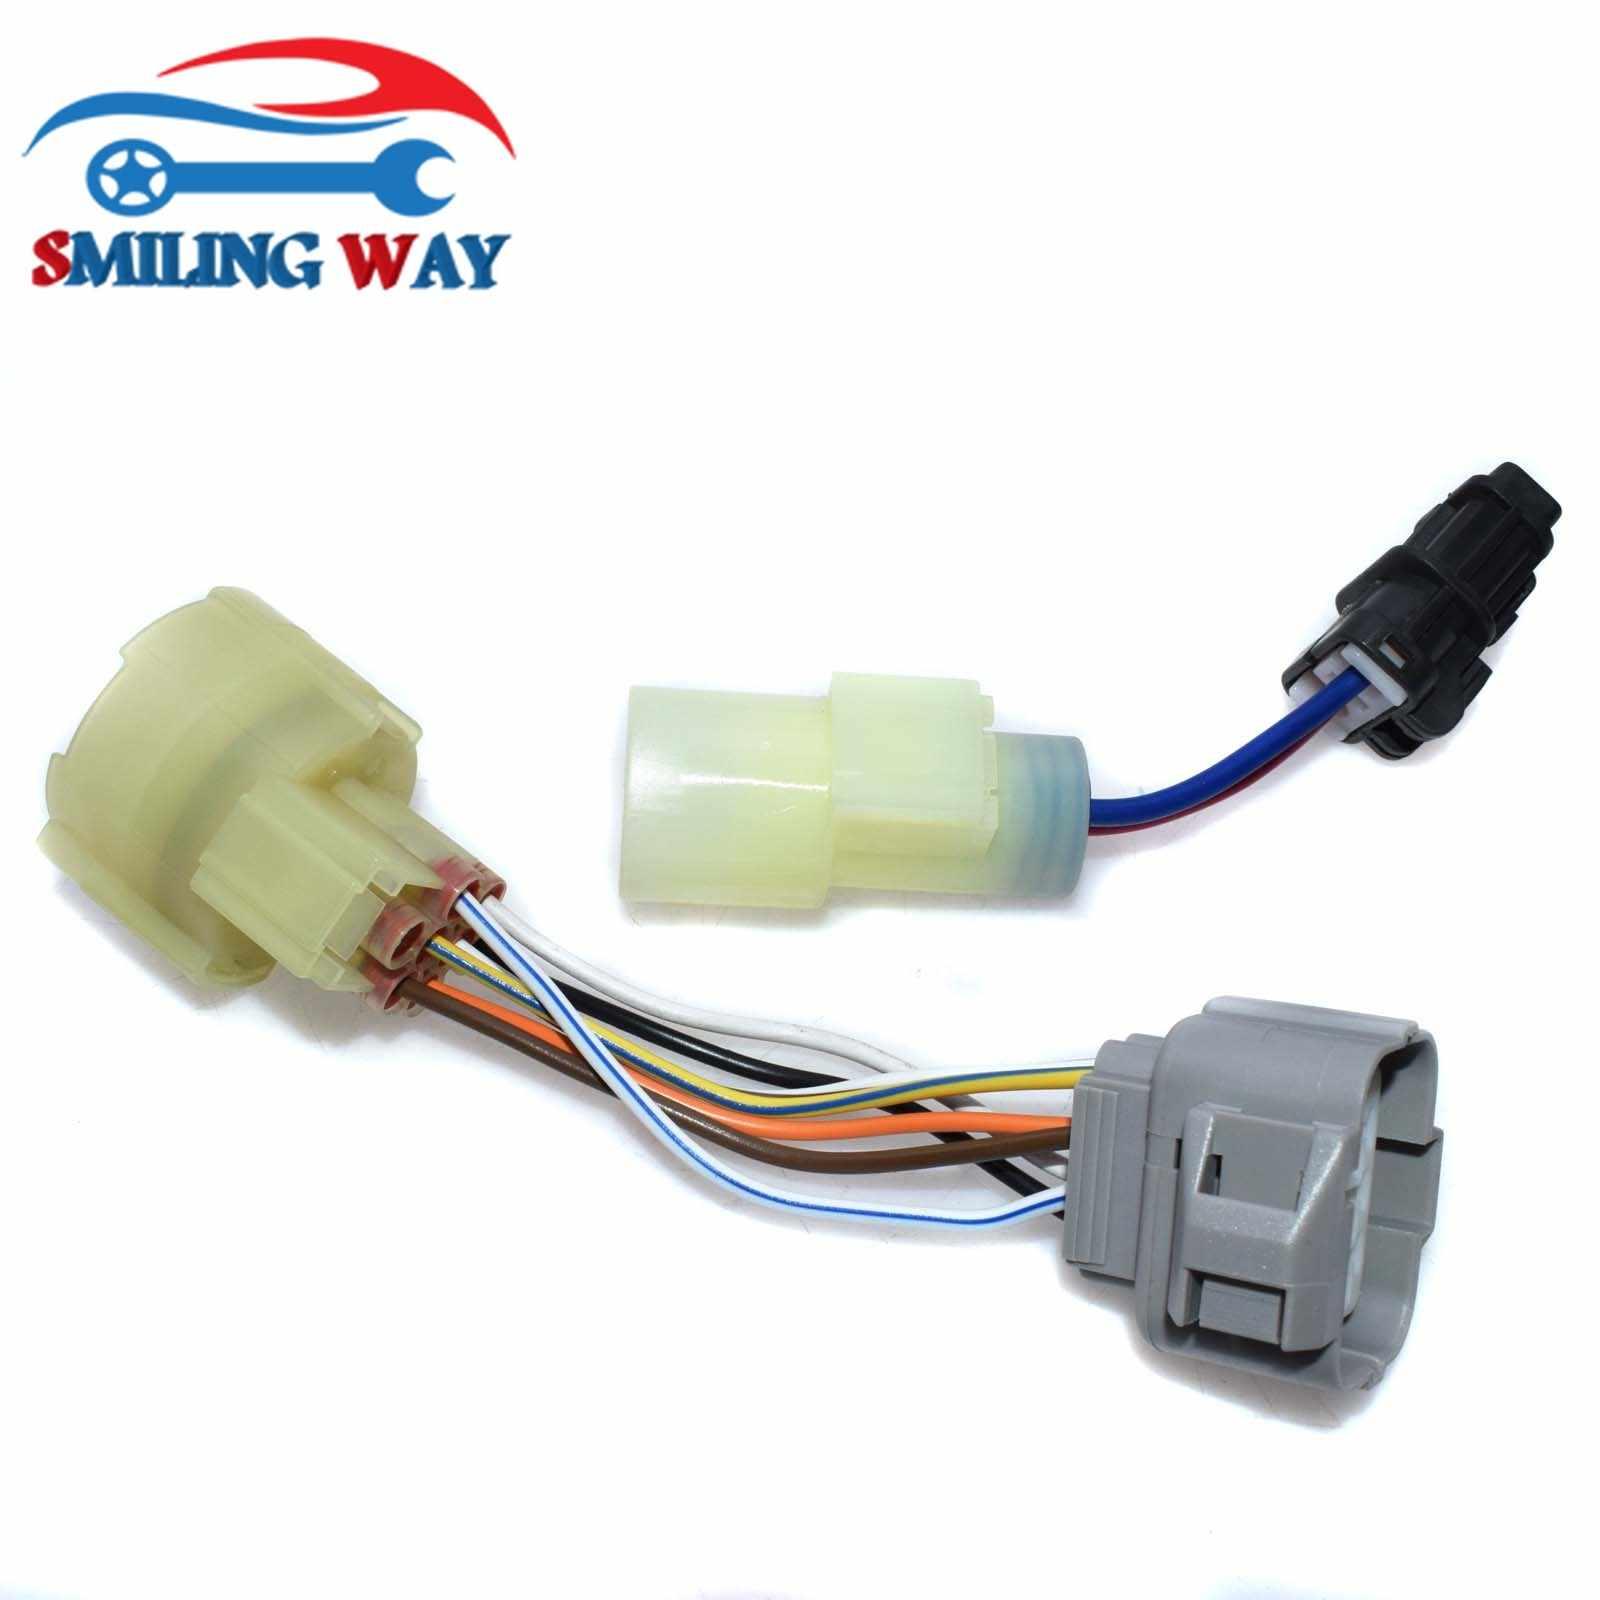 obd0 to obd1 ecu distributor adaptor connector wire harness cable for honda crx civic prelude acura  [ 1600 x 1600 Pixel ]